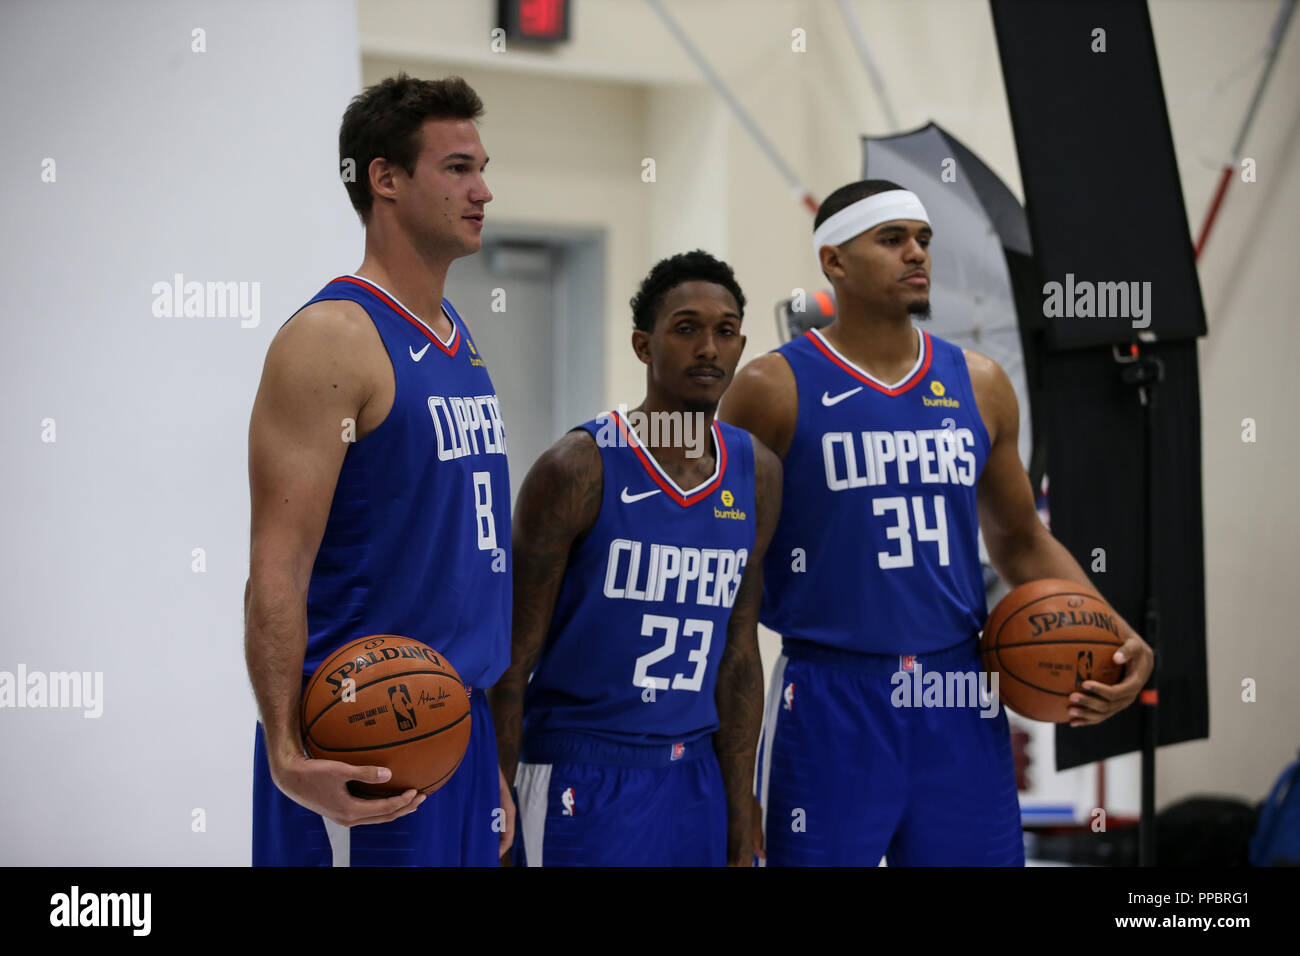 quality design 190ff 57473 Los Angeles, CA, USA. 24th Sep, 2018. LA Clippers forward ...